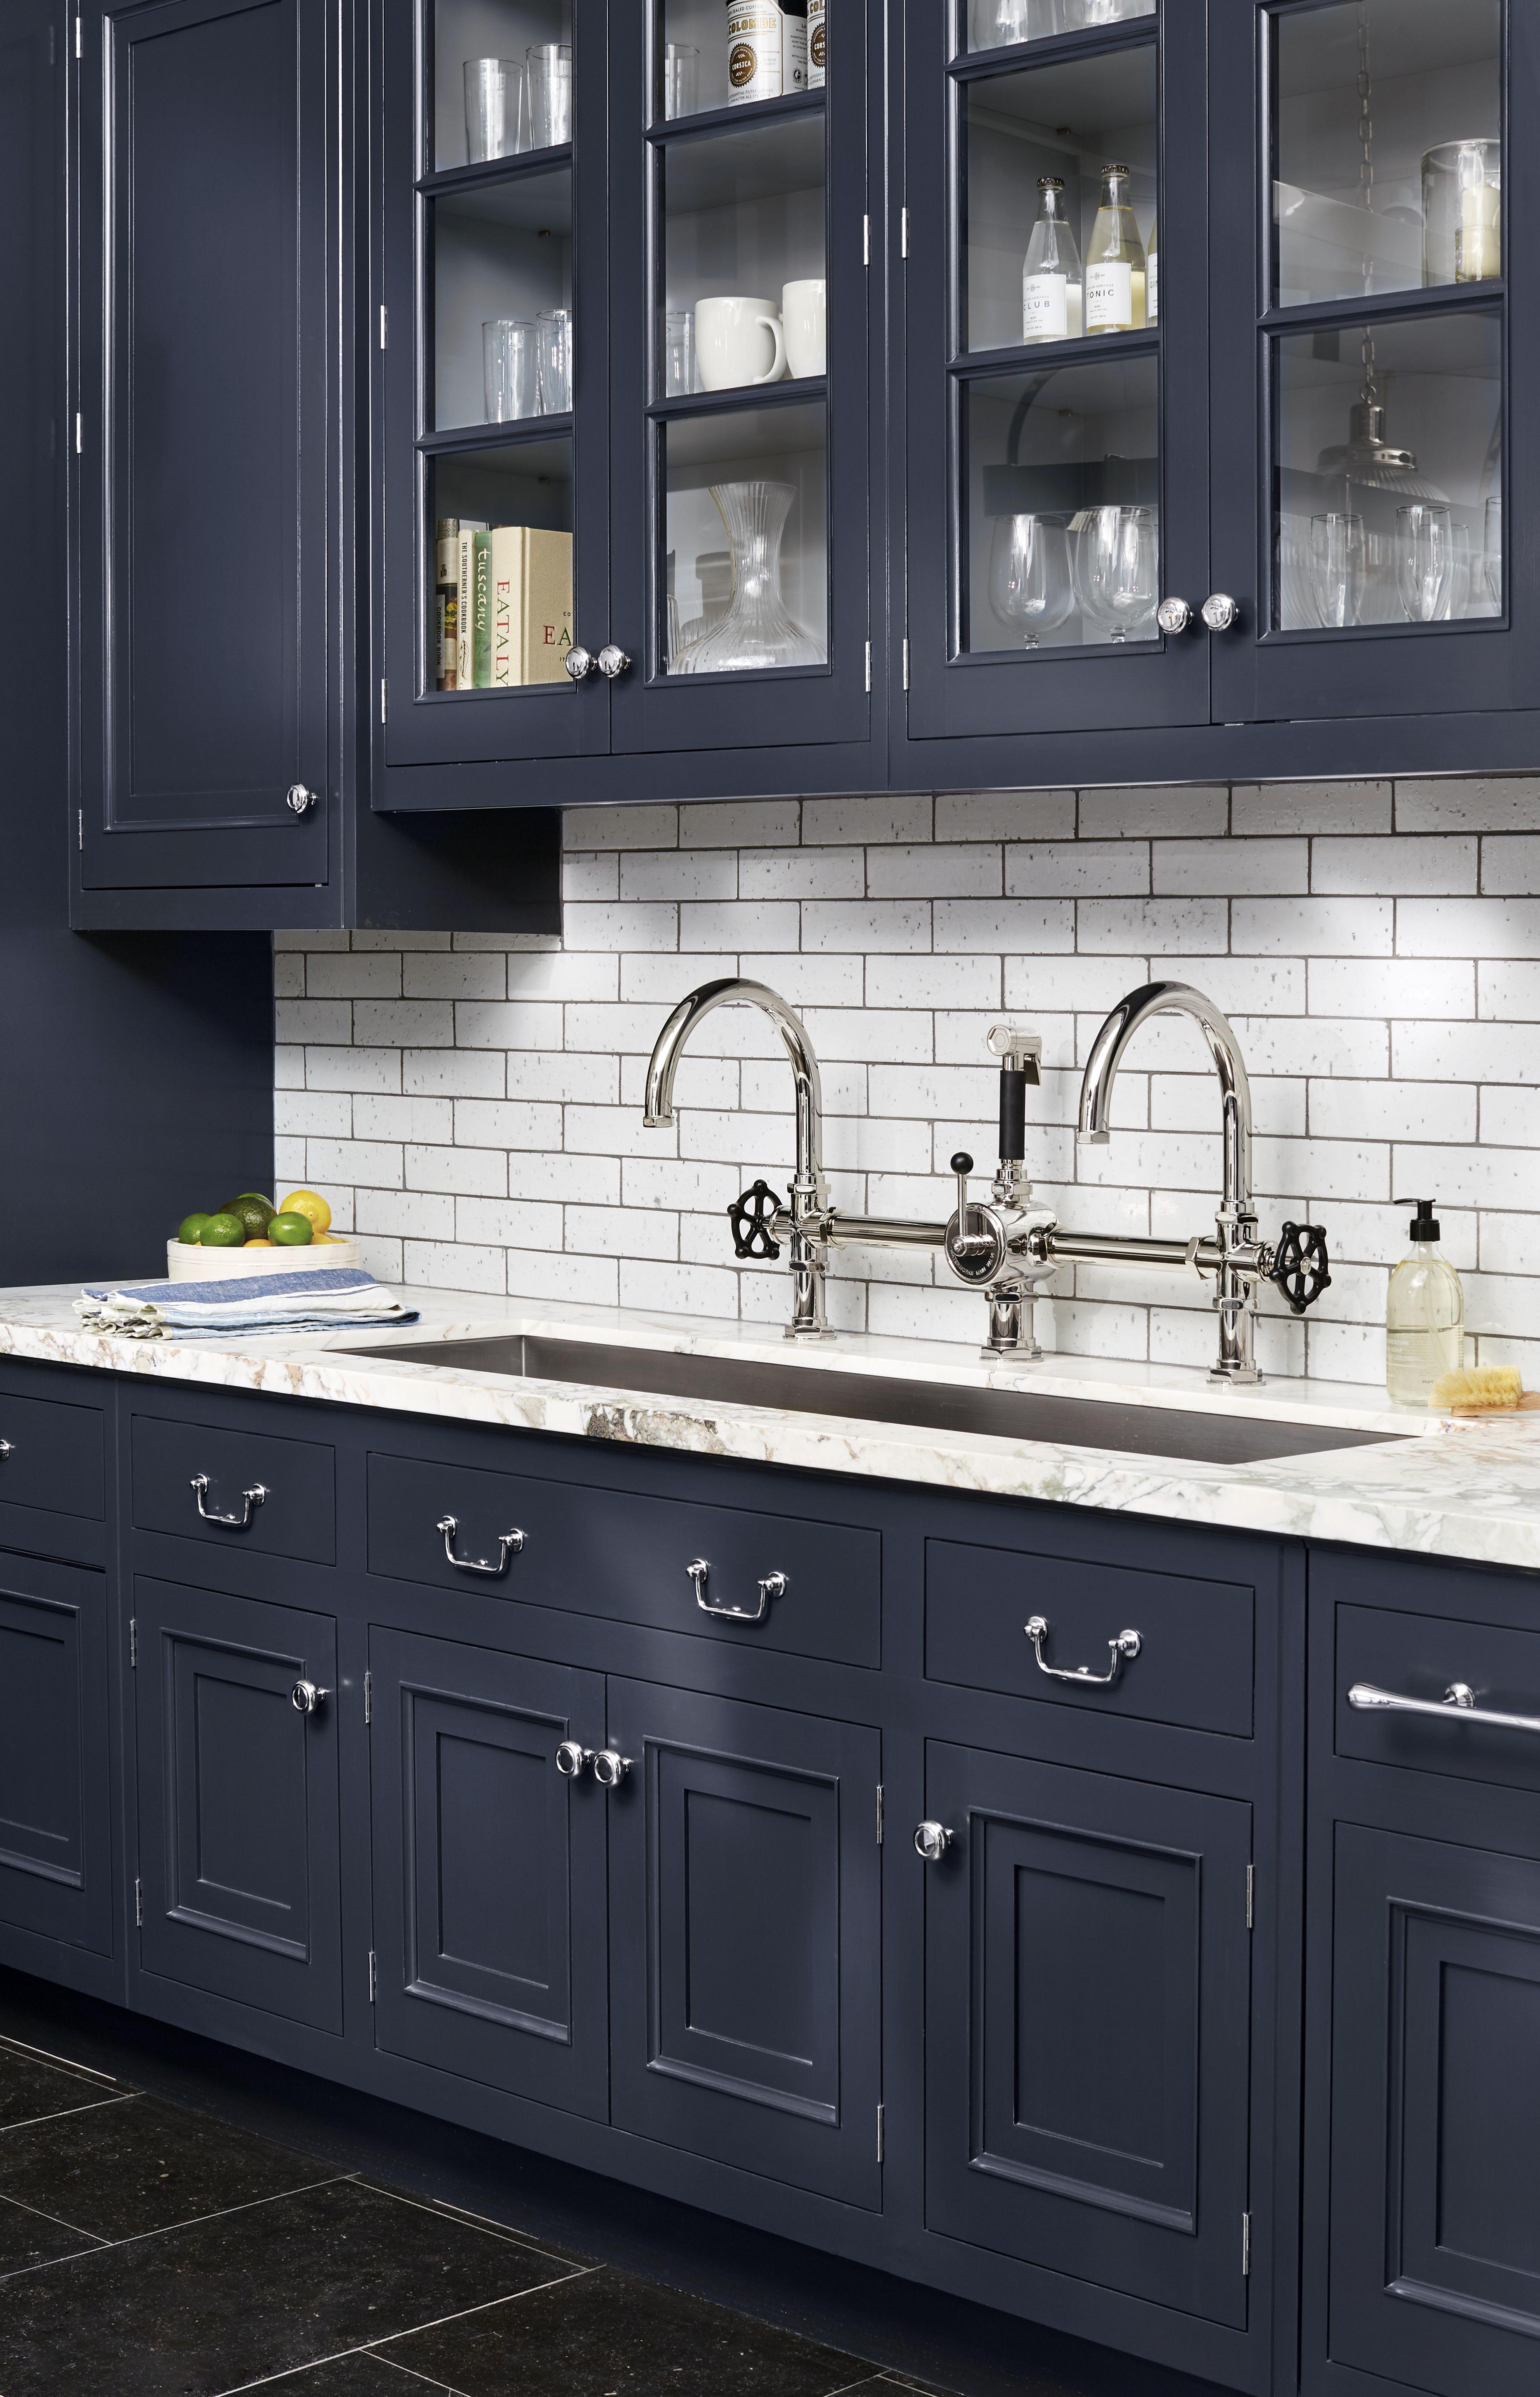 Regulator Gooseneck Double Spout Marquee Kitchen Faucet Matte Black Wheel Handles And Spray Interior Design Kitchen Kitchen Design Kitchen Unit Designs